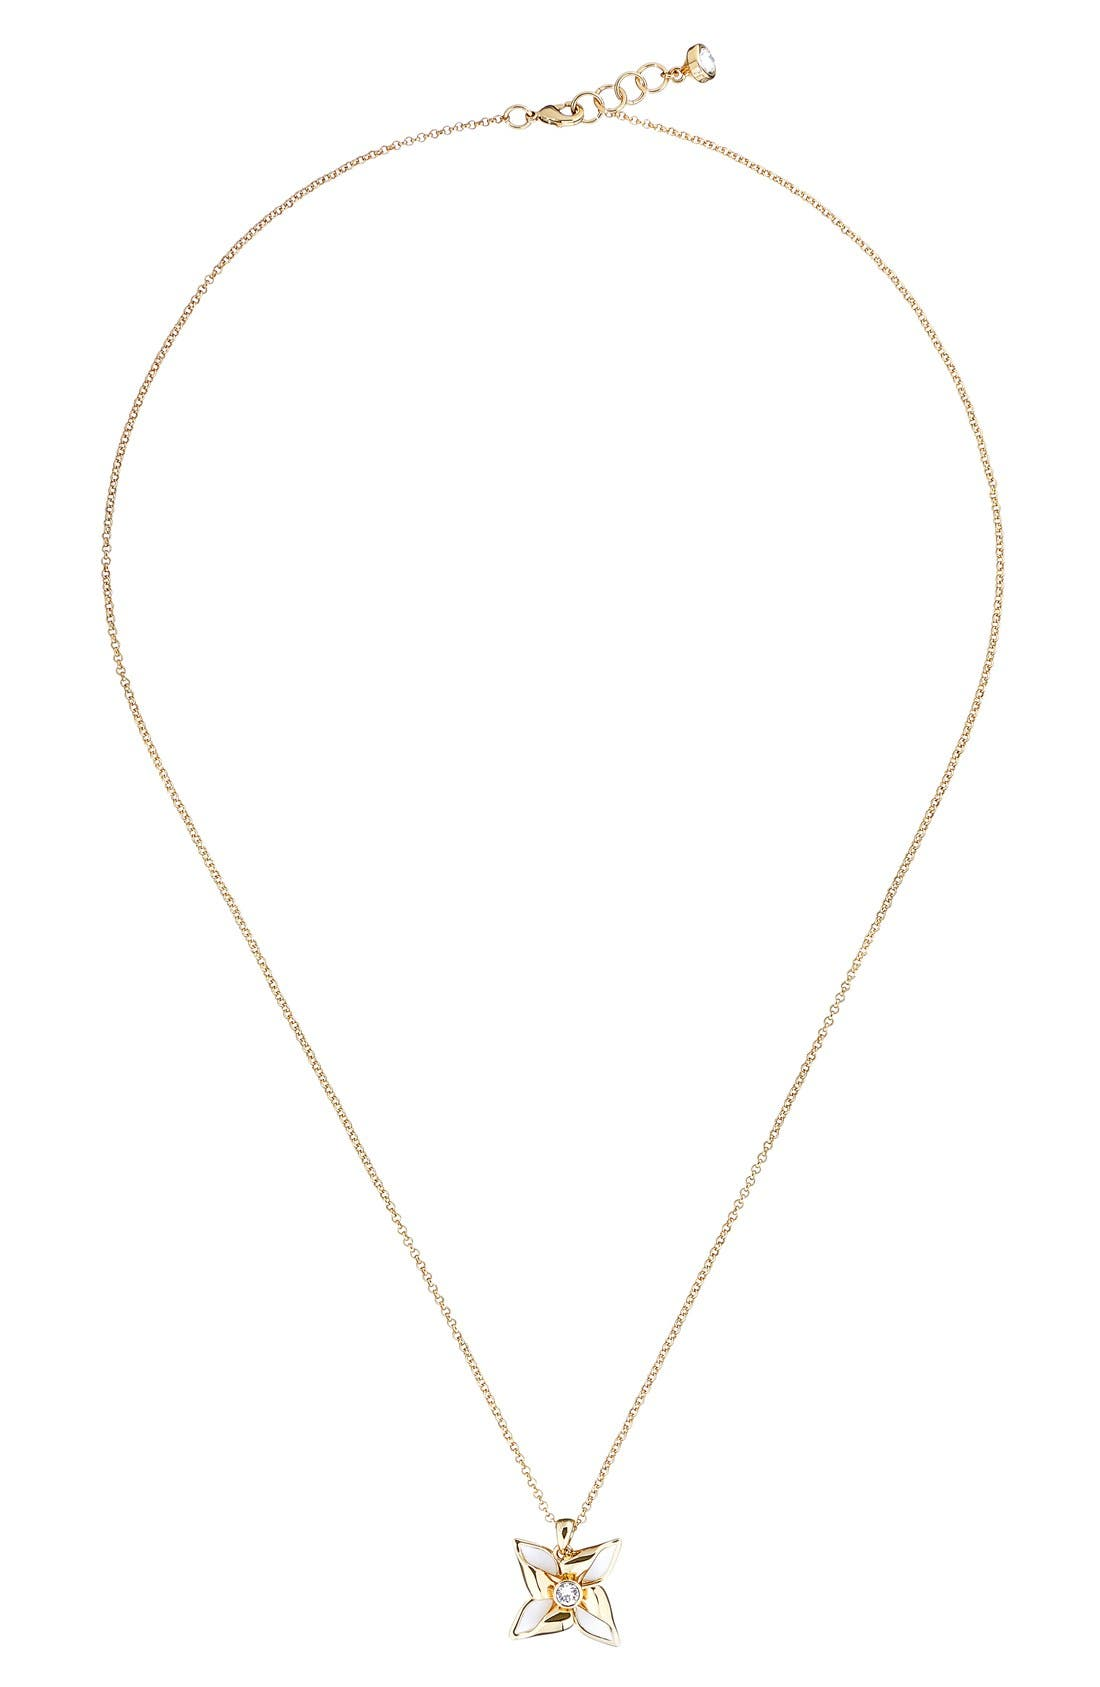 Kineta Pendant Necklace,                         Main,                         color, Gold/ White